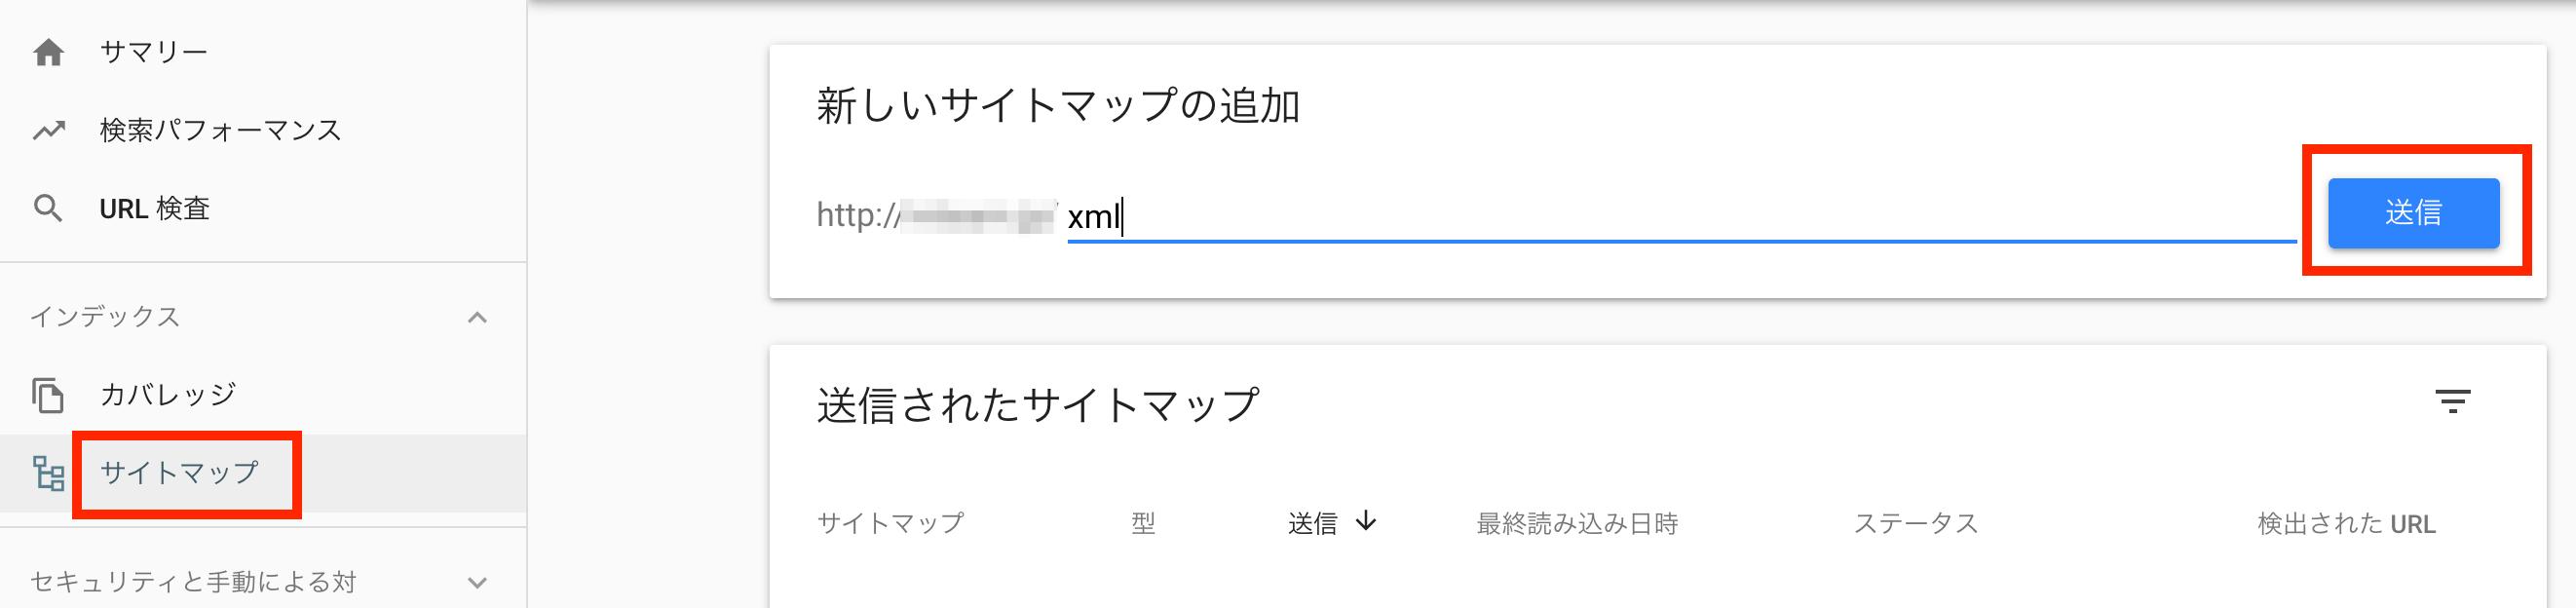 searchconsole_サイトマップ